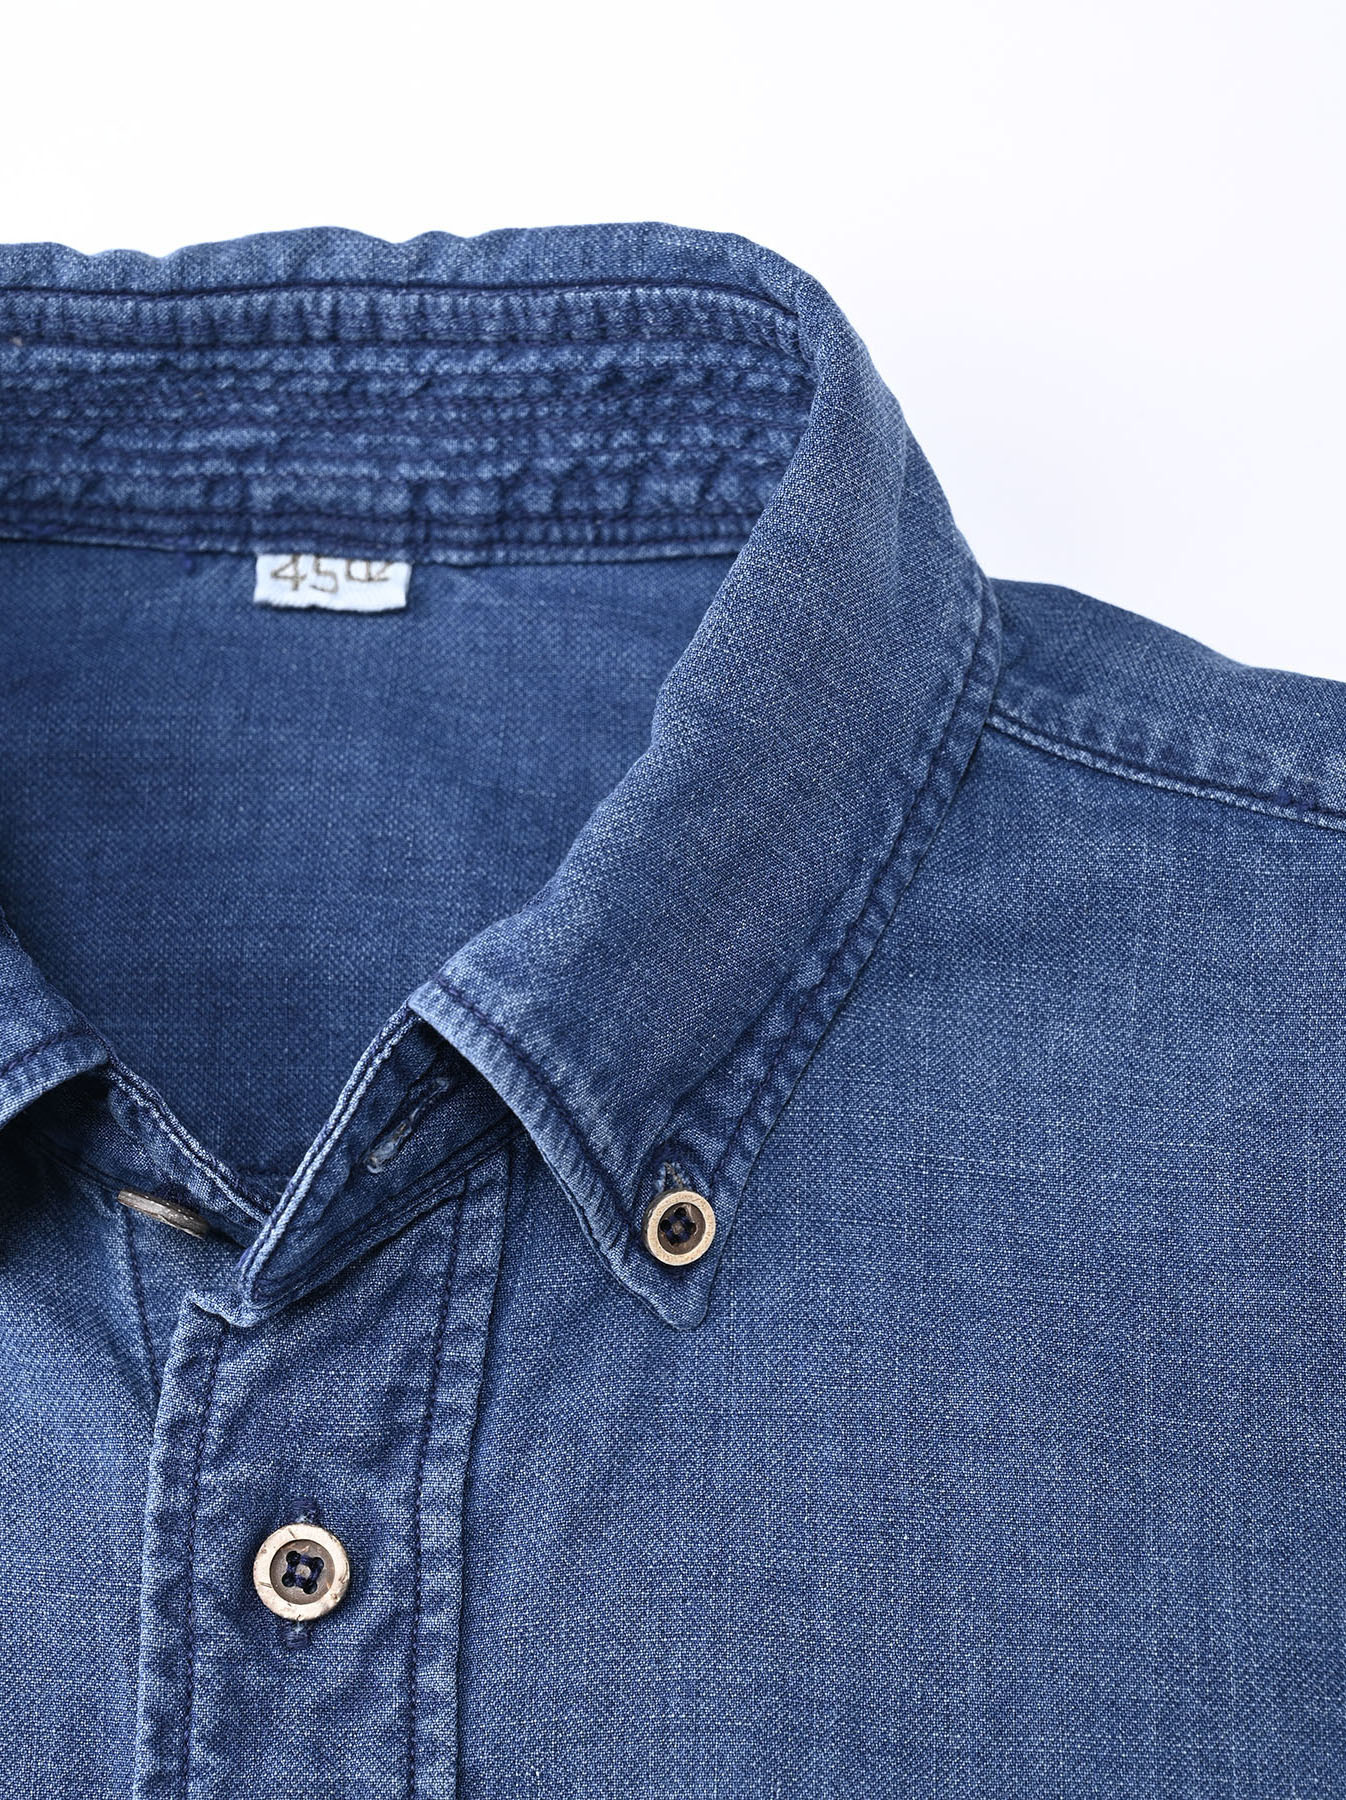 Indigo Gauze 908 Ocean Shirt Distressed-6